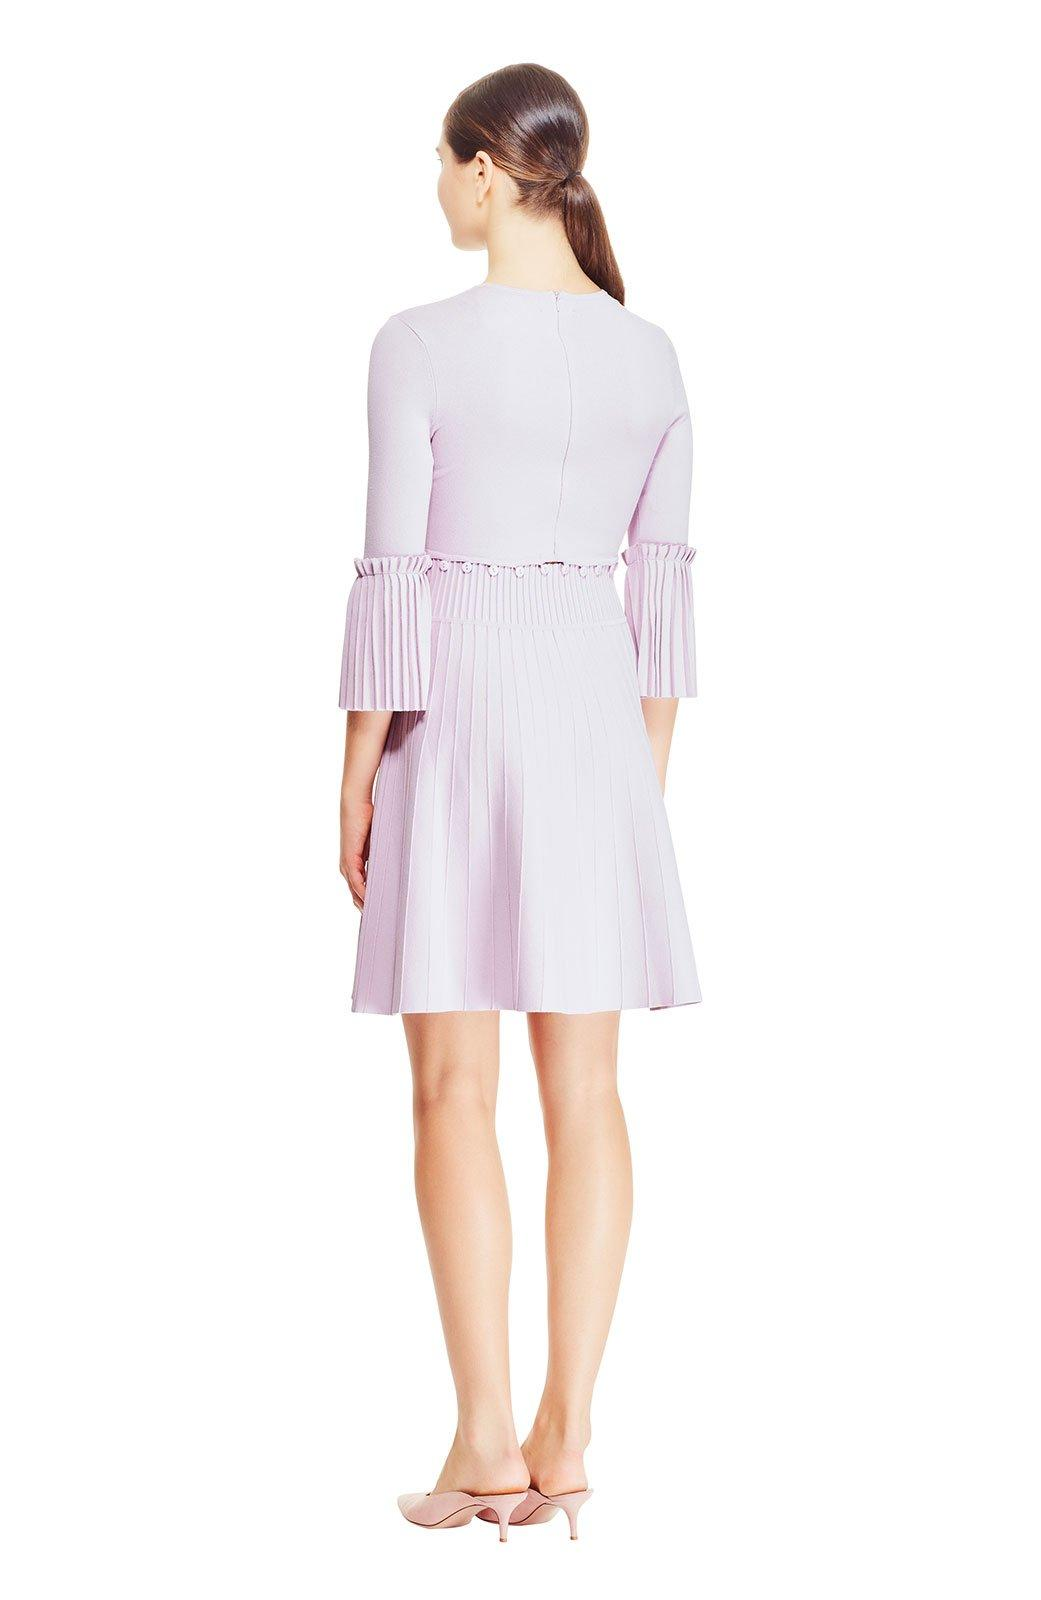 ad59f5f2c3 Lela Rose - Purple Pleated Skirt Knit Dress - Lyst. View fullscreen